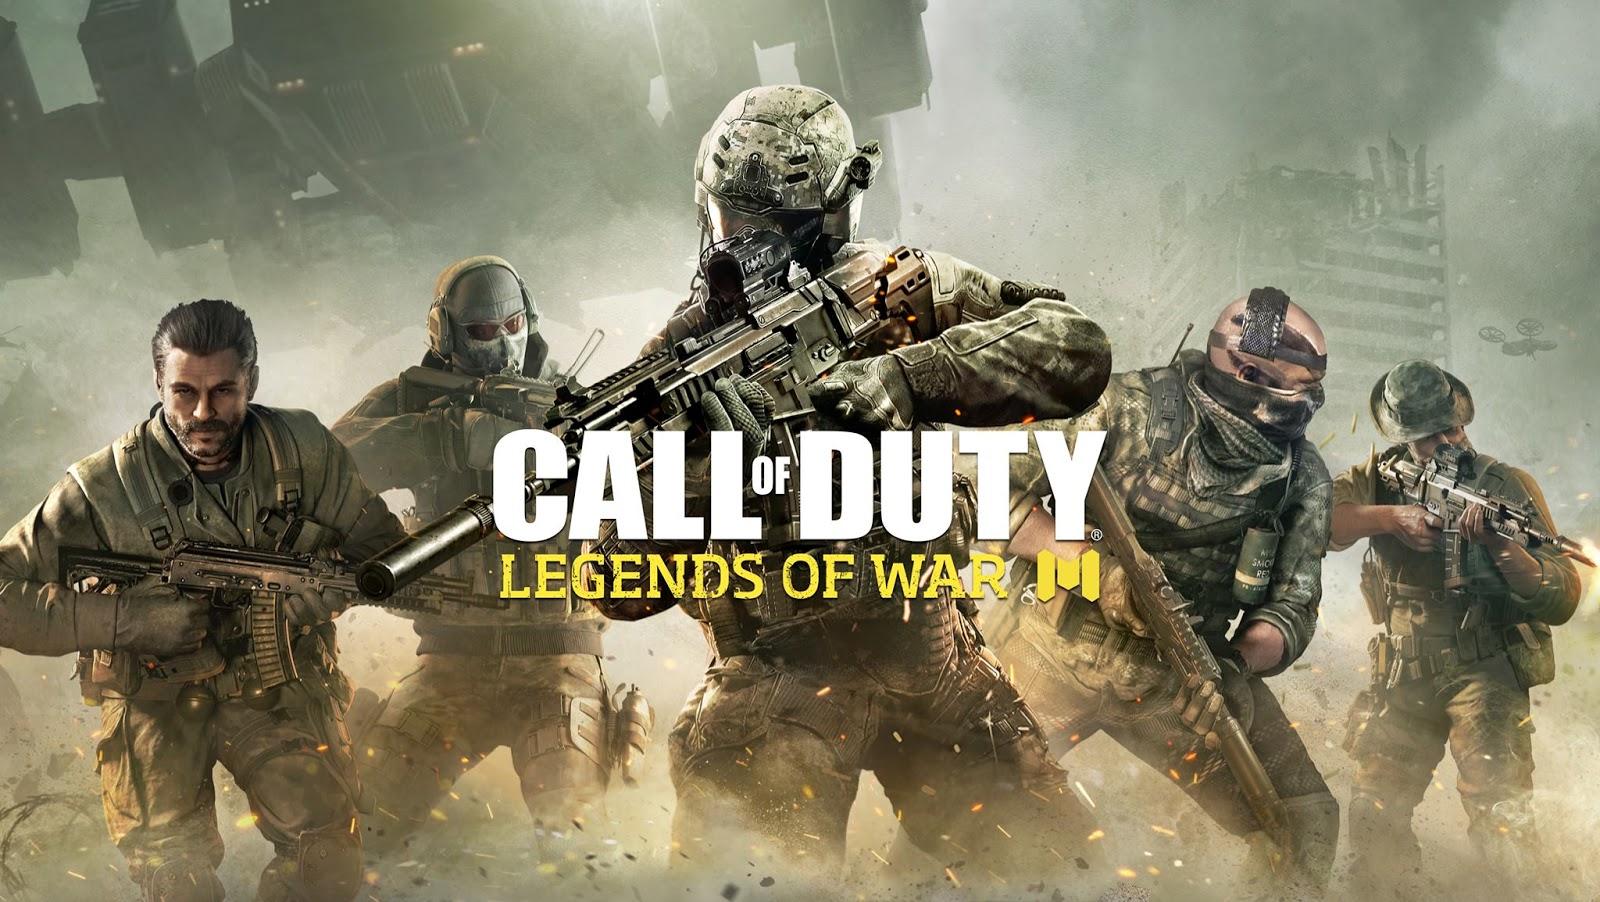 تحميل لعبة كول اوف ديوتي للاندرويد اون لاين - Download Call Of Duty Legends Of War Mobile